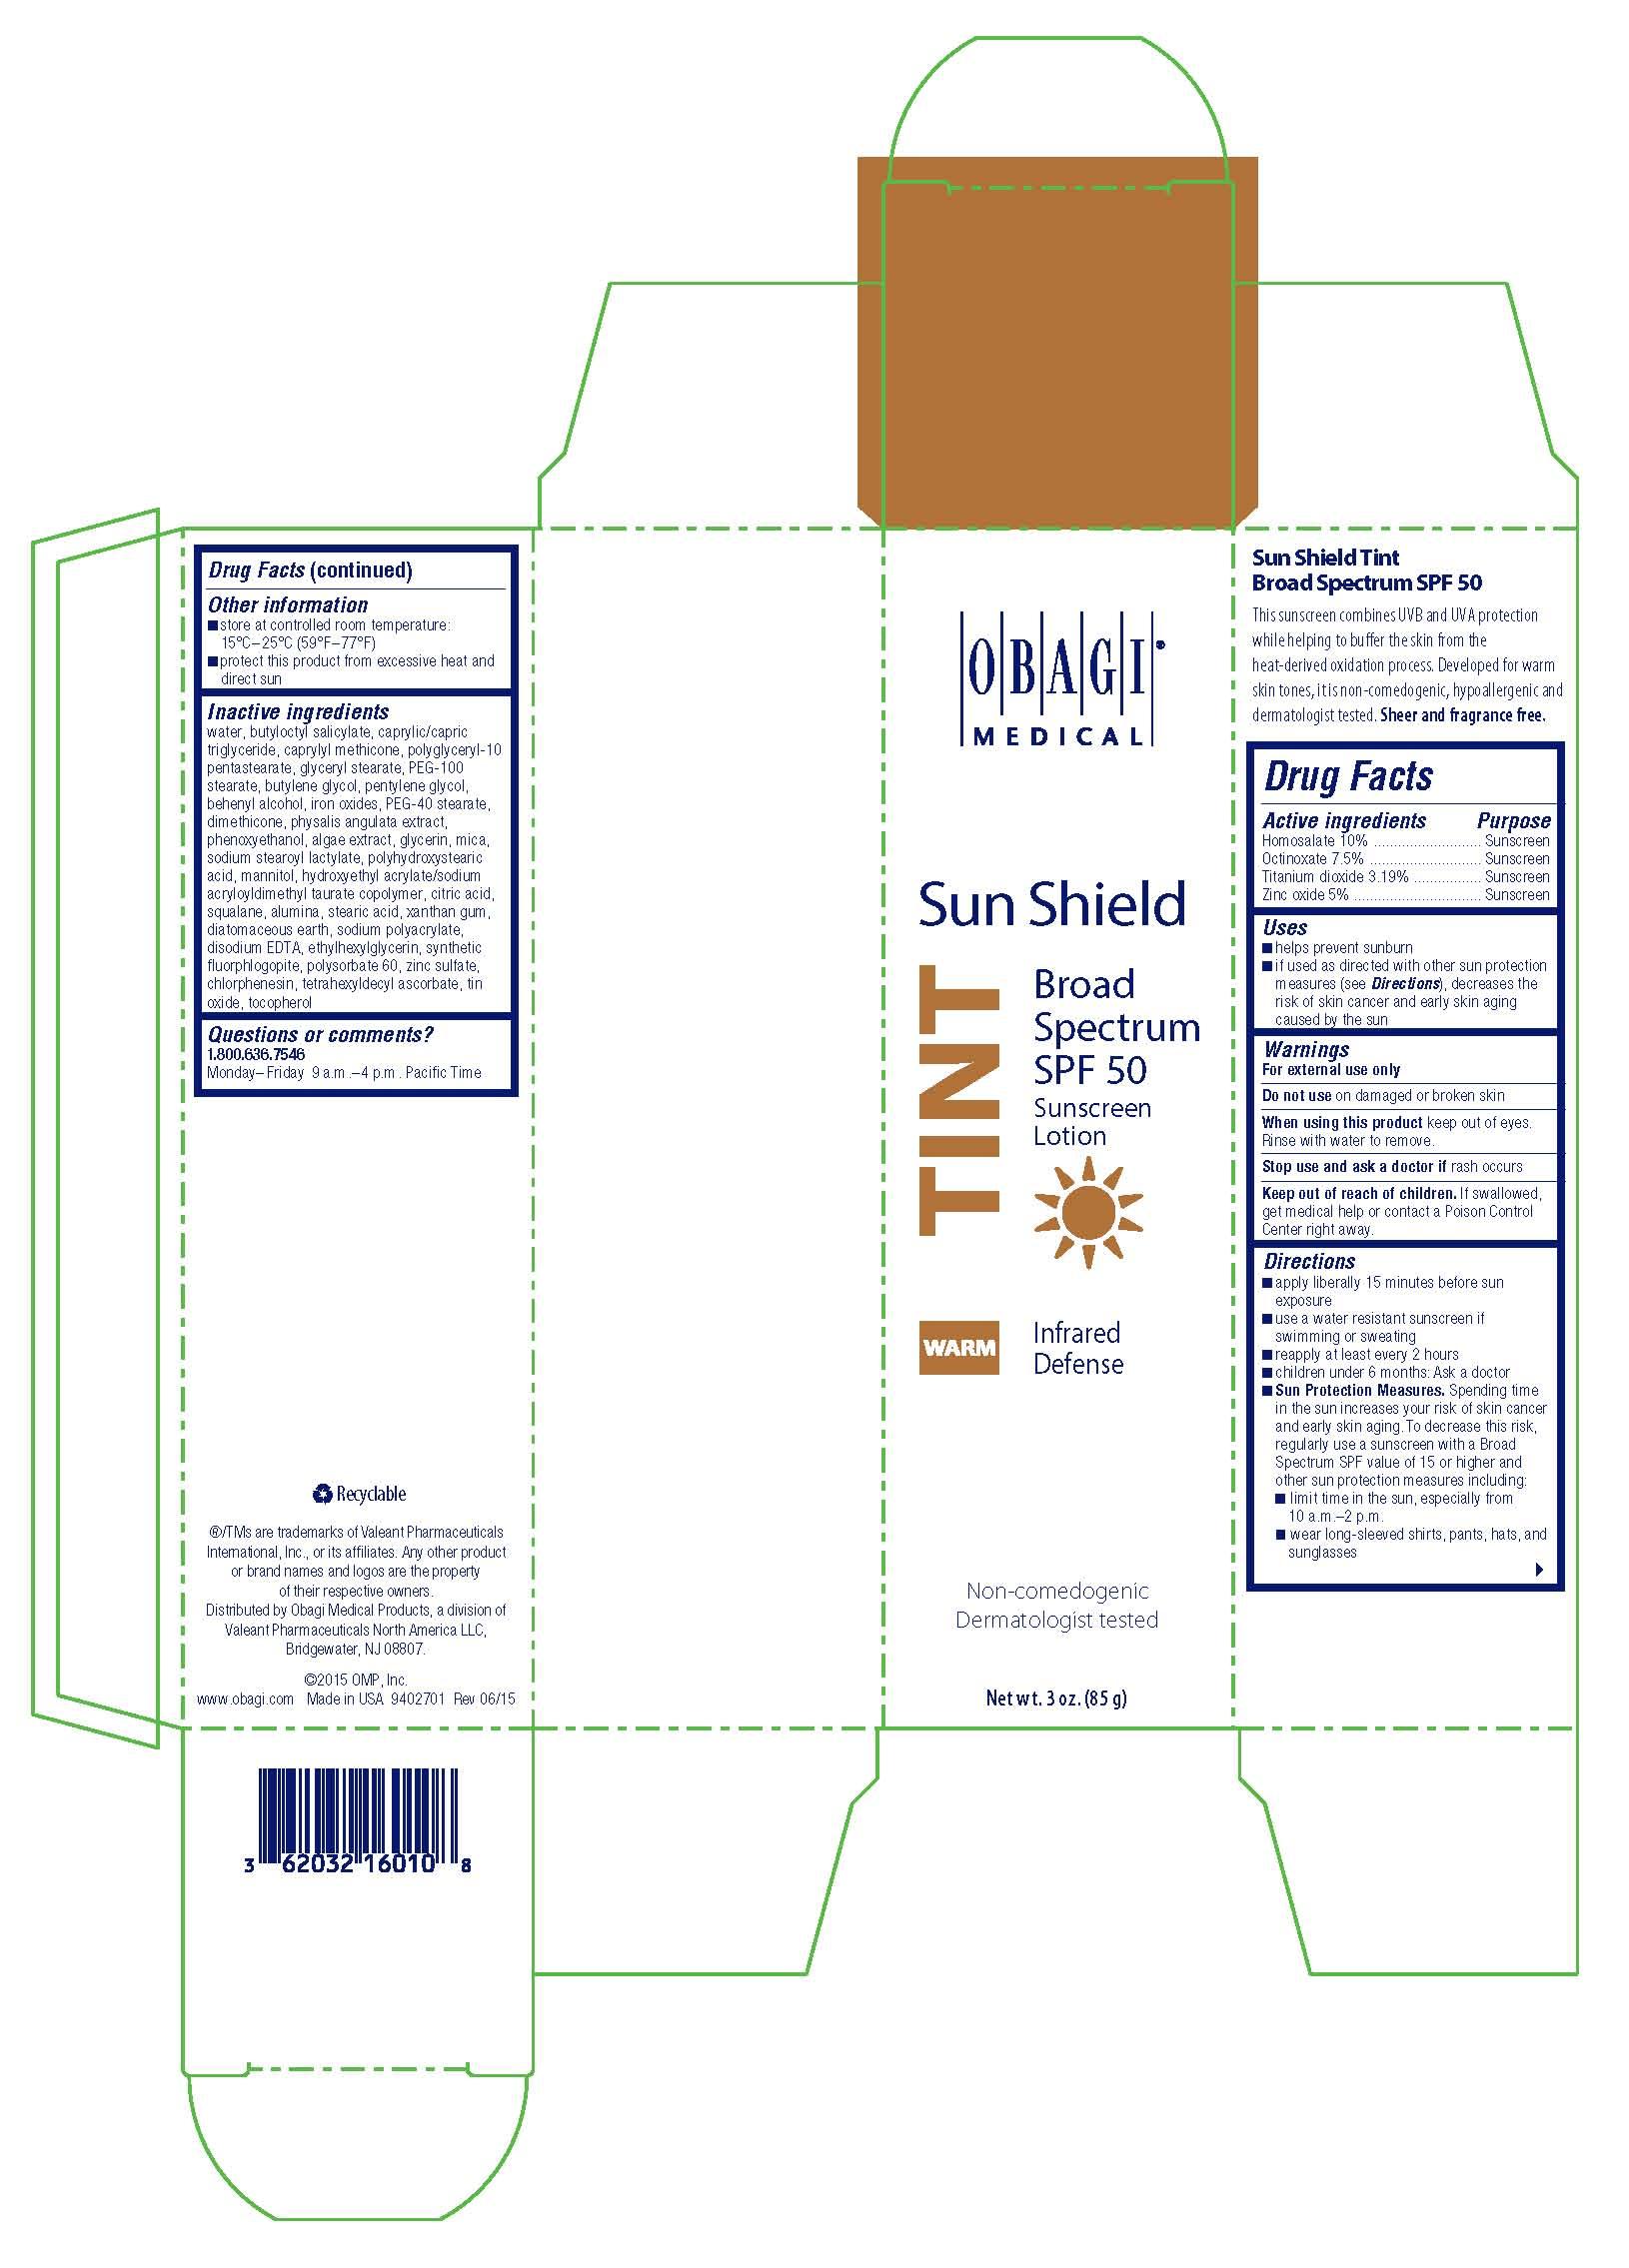 Obagi Sun Shield TINT Warm Sunscreen Broad Spectrum SPF 50 Carton